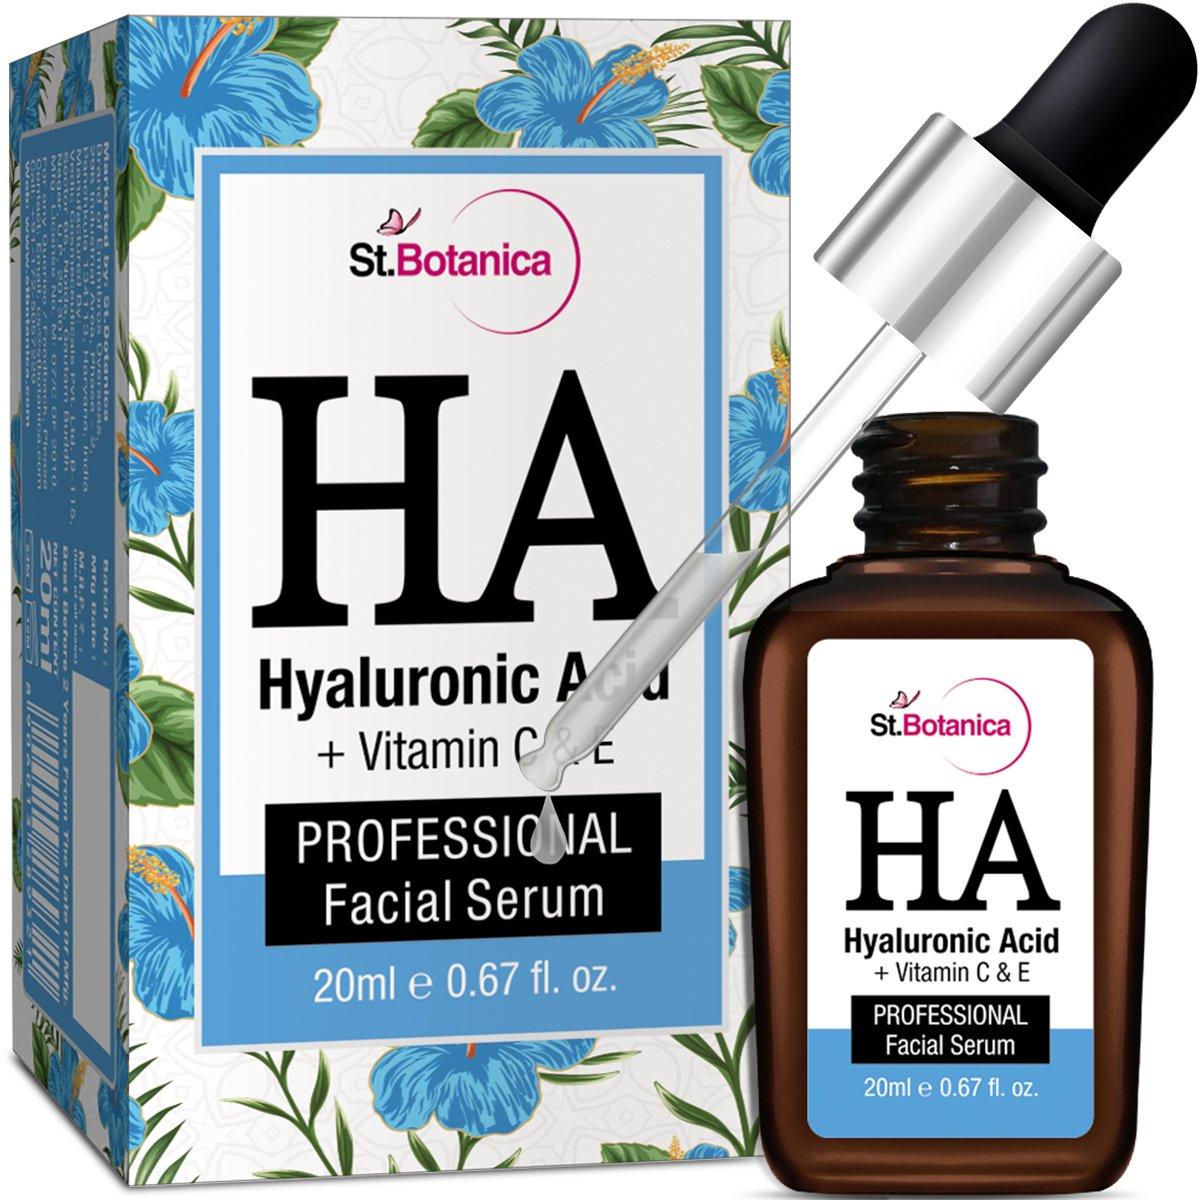 StBotanica Hyaluronic Acid Facial Serum + Vitamin C, E - 20ml - Under Eye Dark Circles, Anti Aging, Skin Fairness Brightening product image